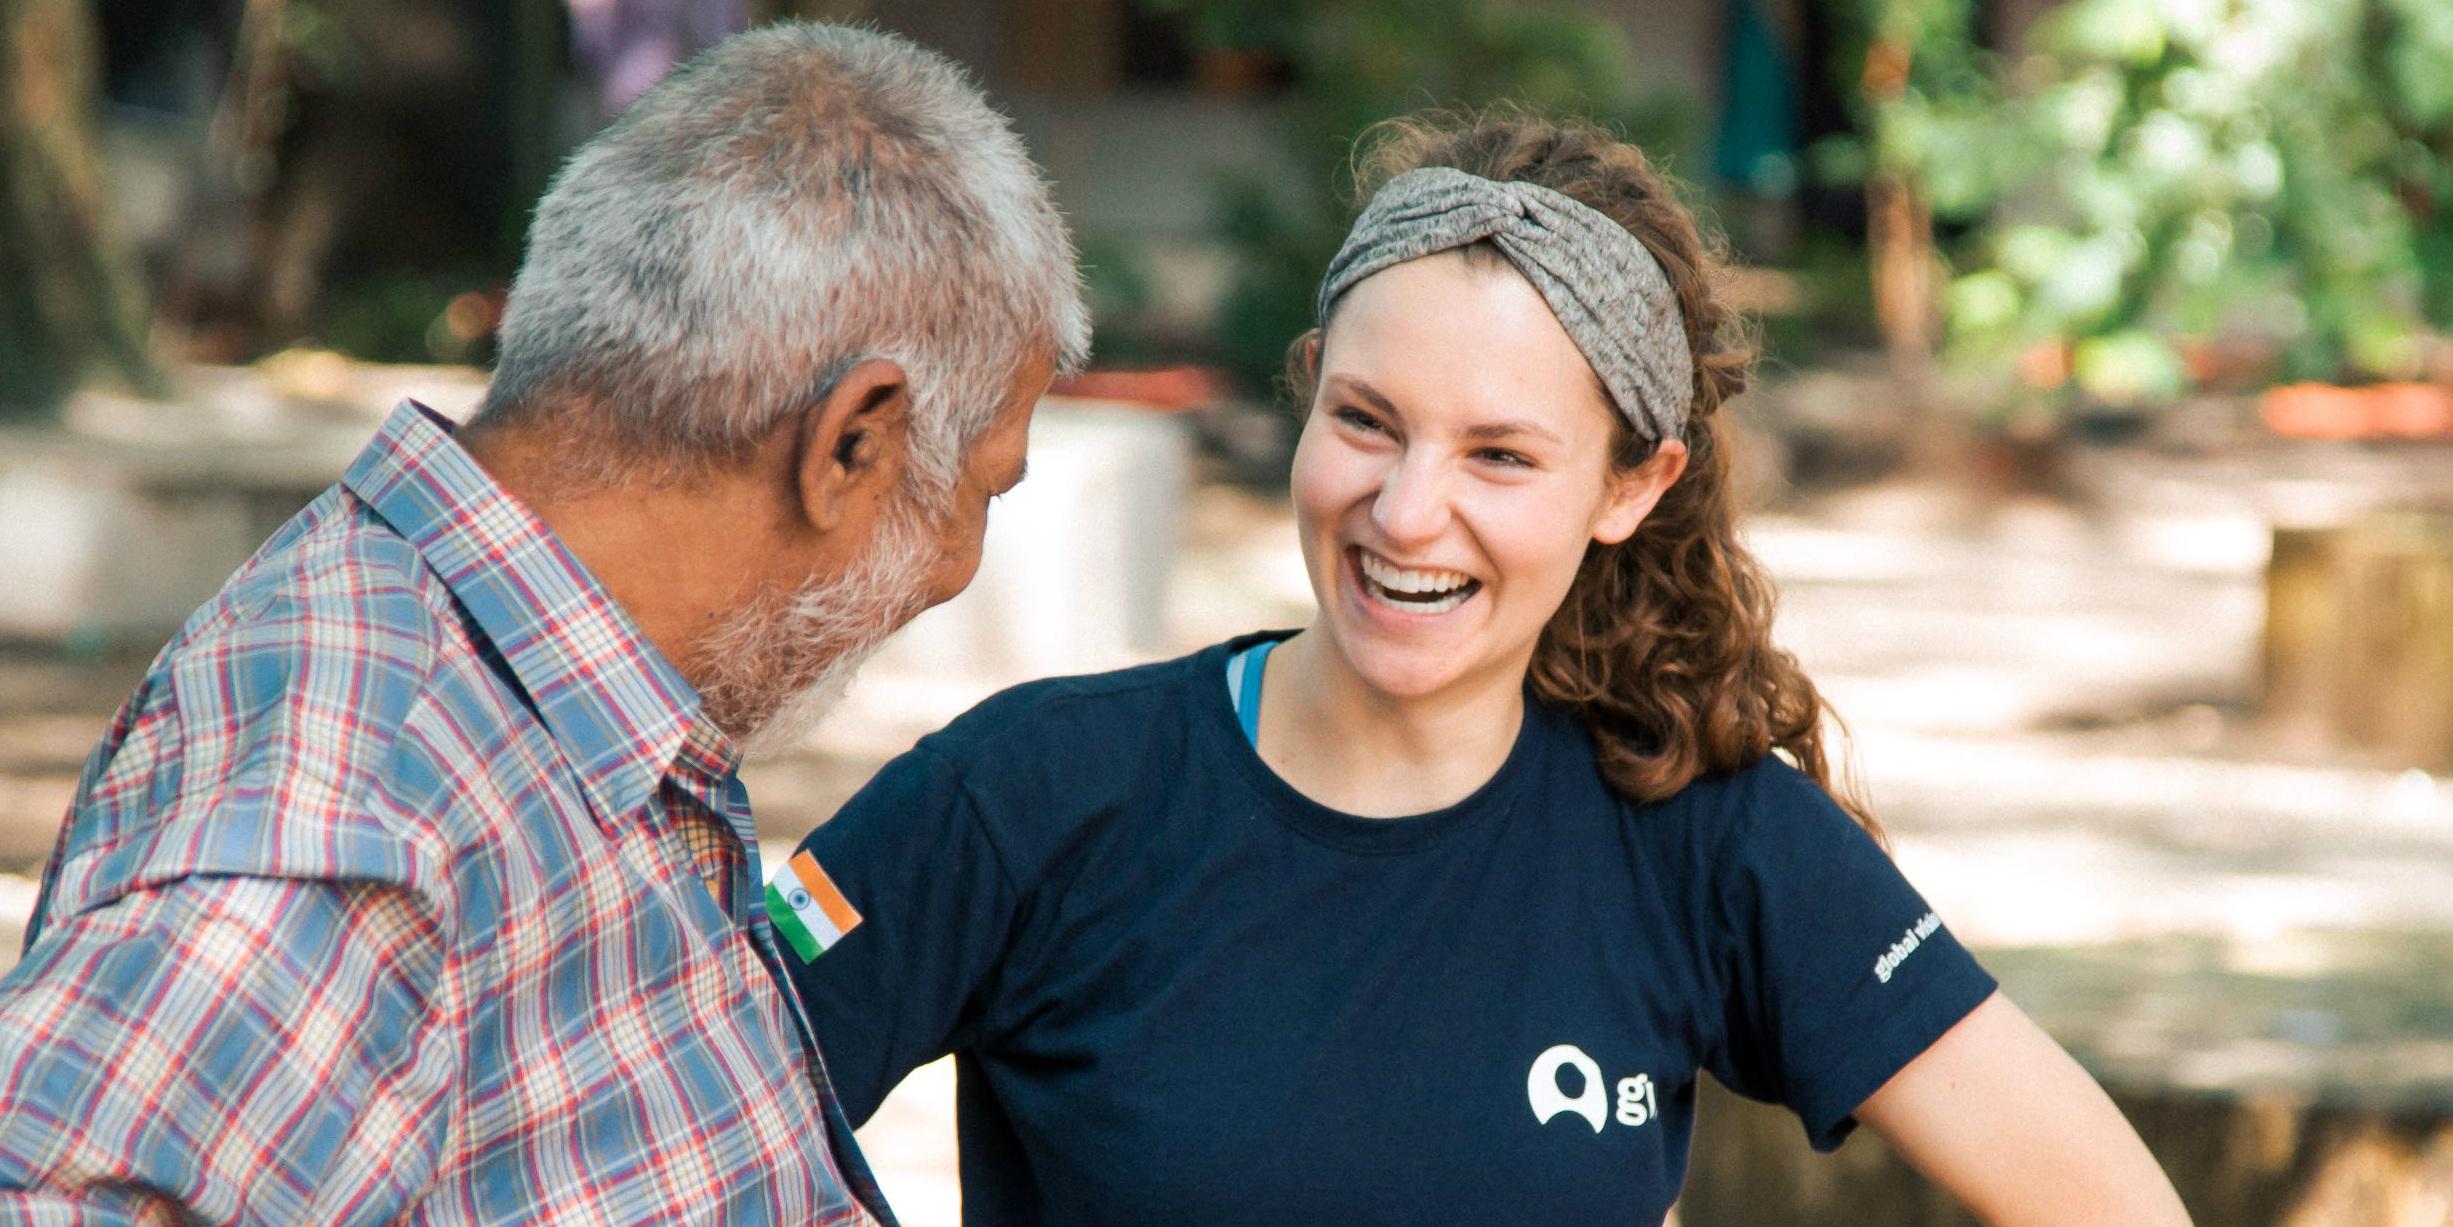 improve your cross-cultural communication skills